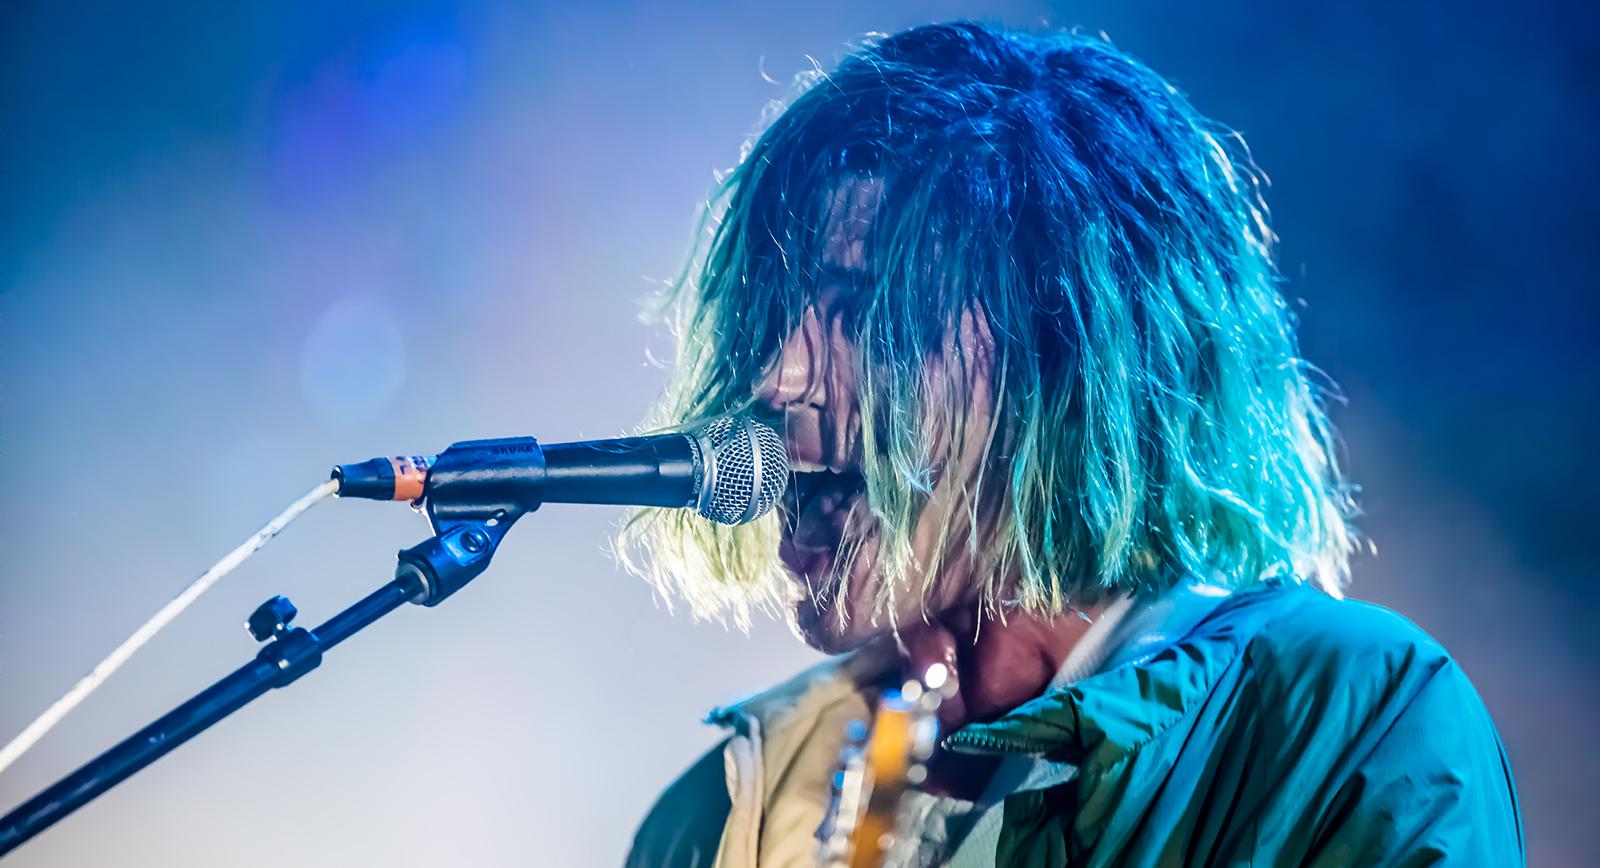 grouplove-tour-2016-concert-review-photos-fox-theater-oakland-fi